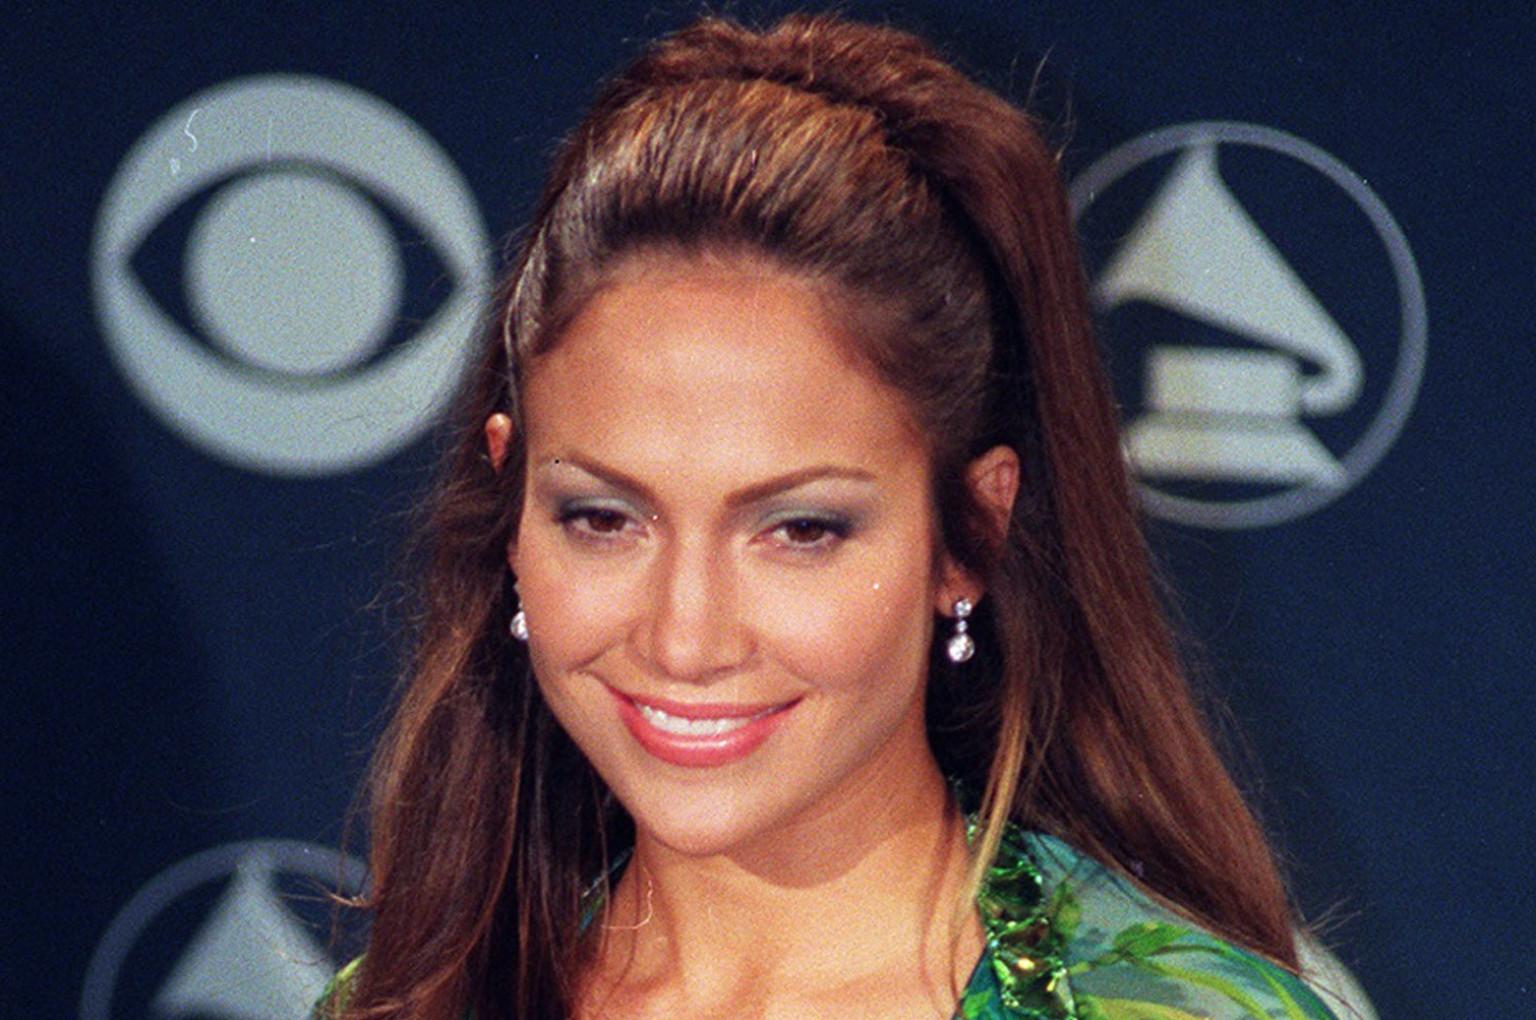 Jennifer Lopez: Jennifer Lopez On THAT Green Dress: 'What's The Big Deal